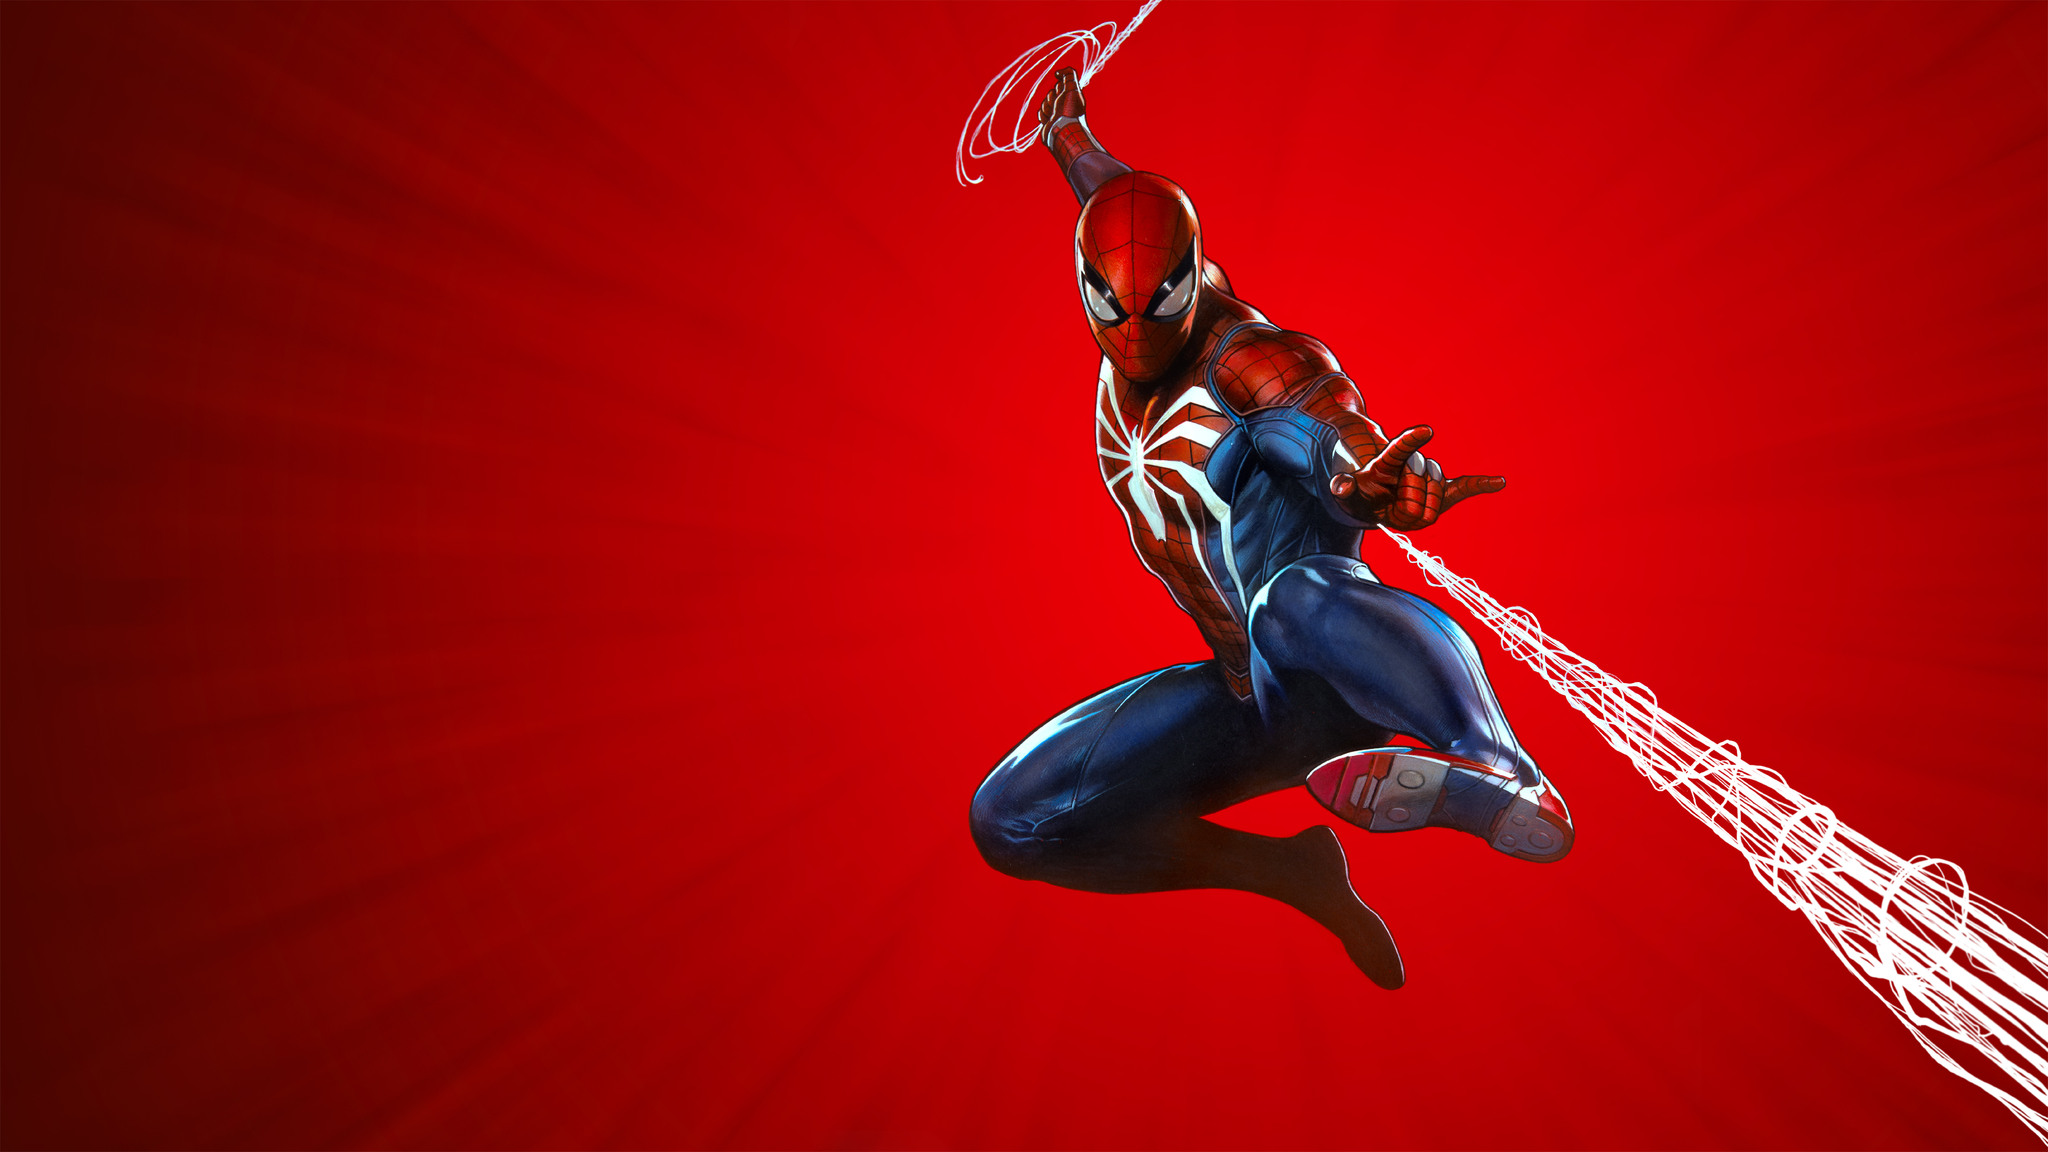 2048x1152 Marvels Spider Man Ps4 Theme Art 10k 2048x1152 Resolution